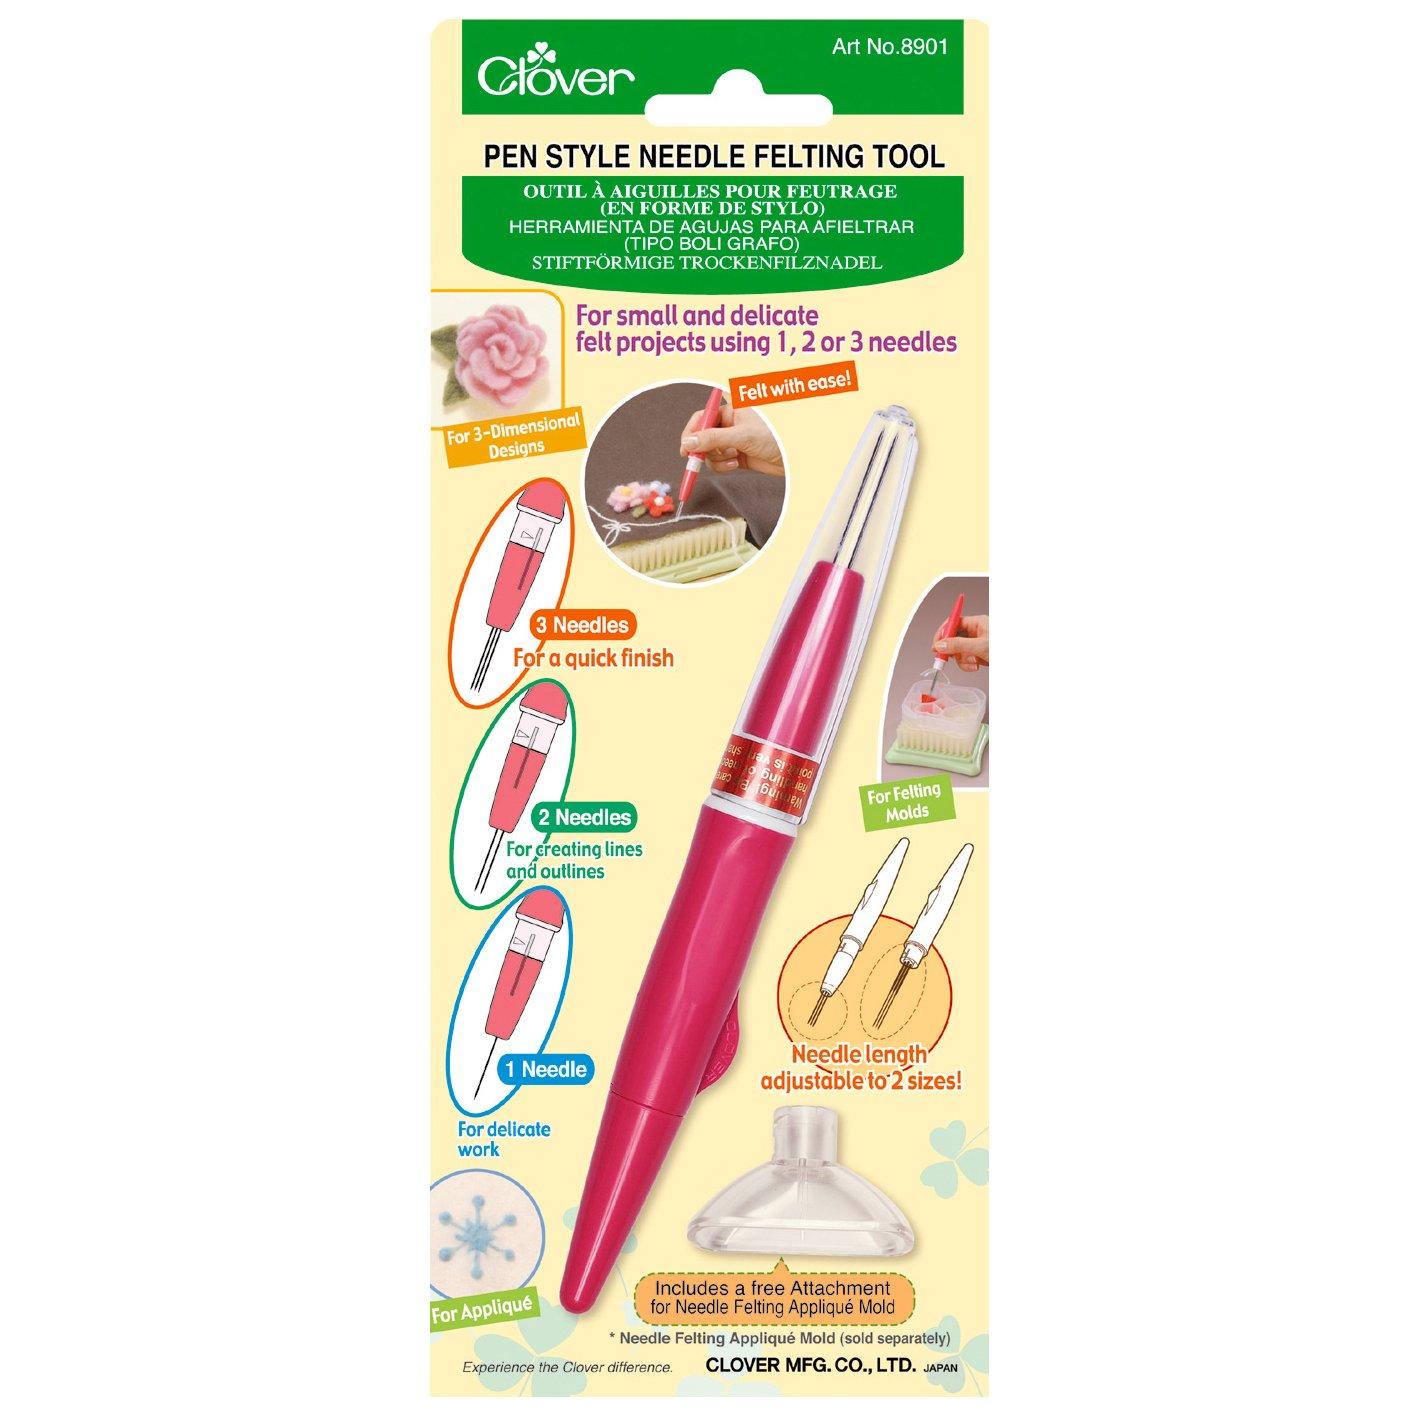 Pen Style Needing Felting Tool by Clover